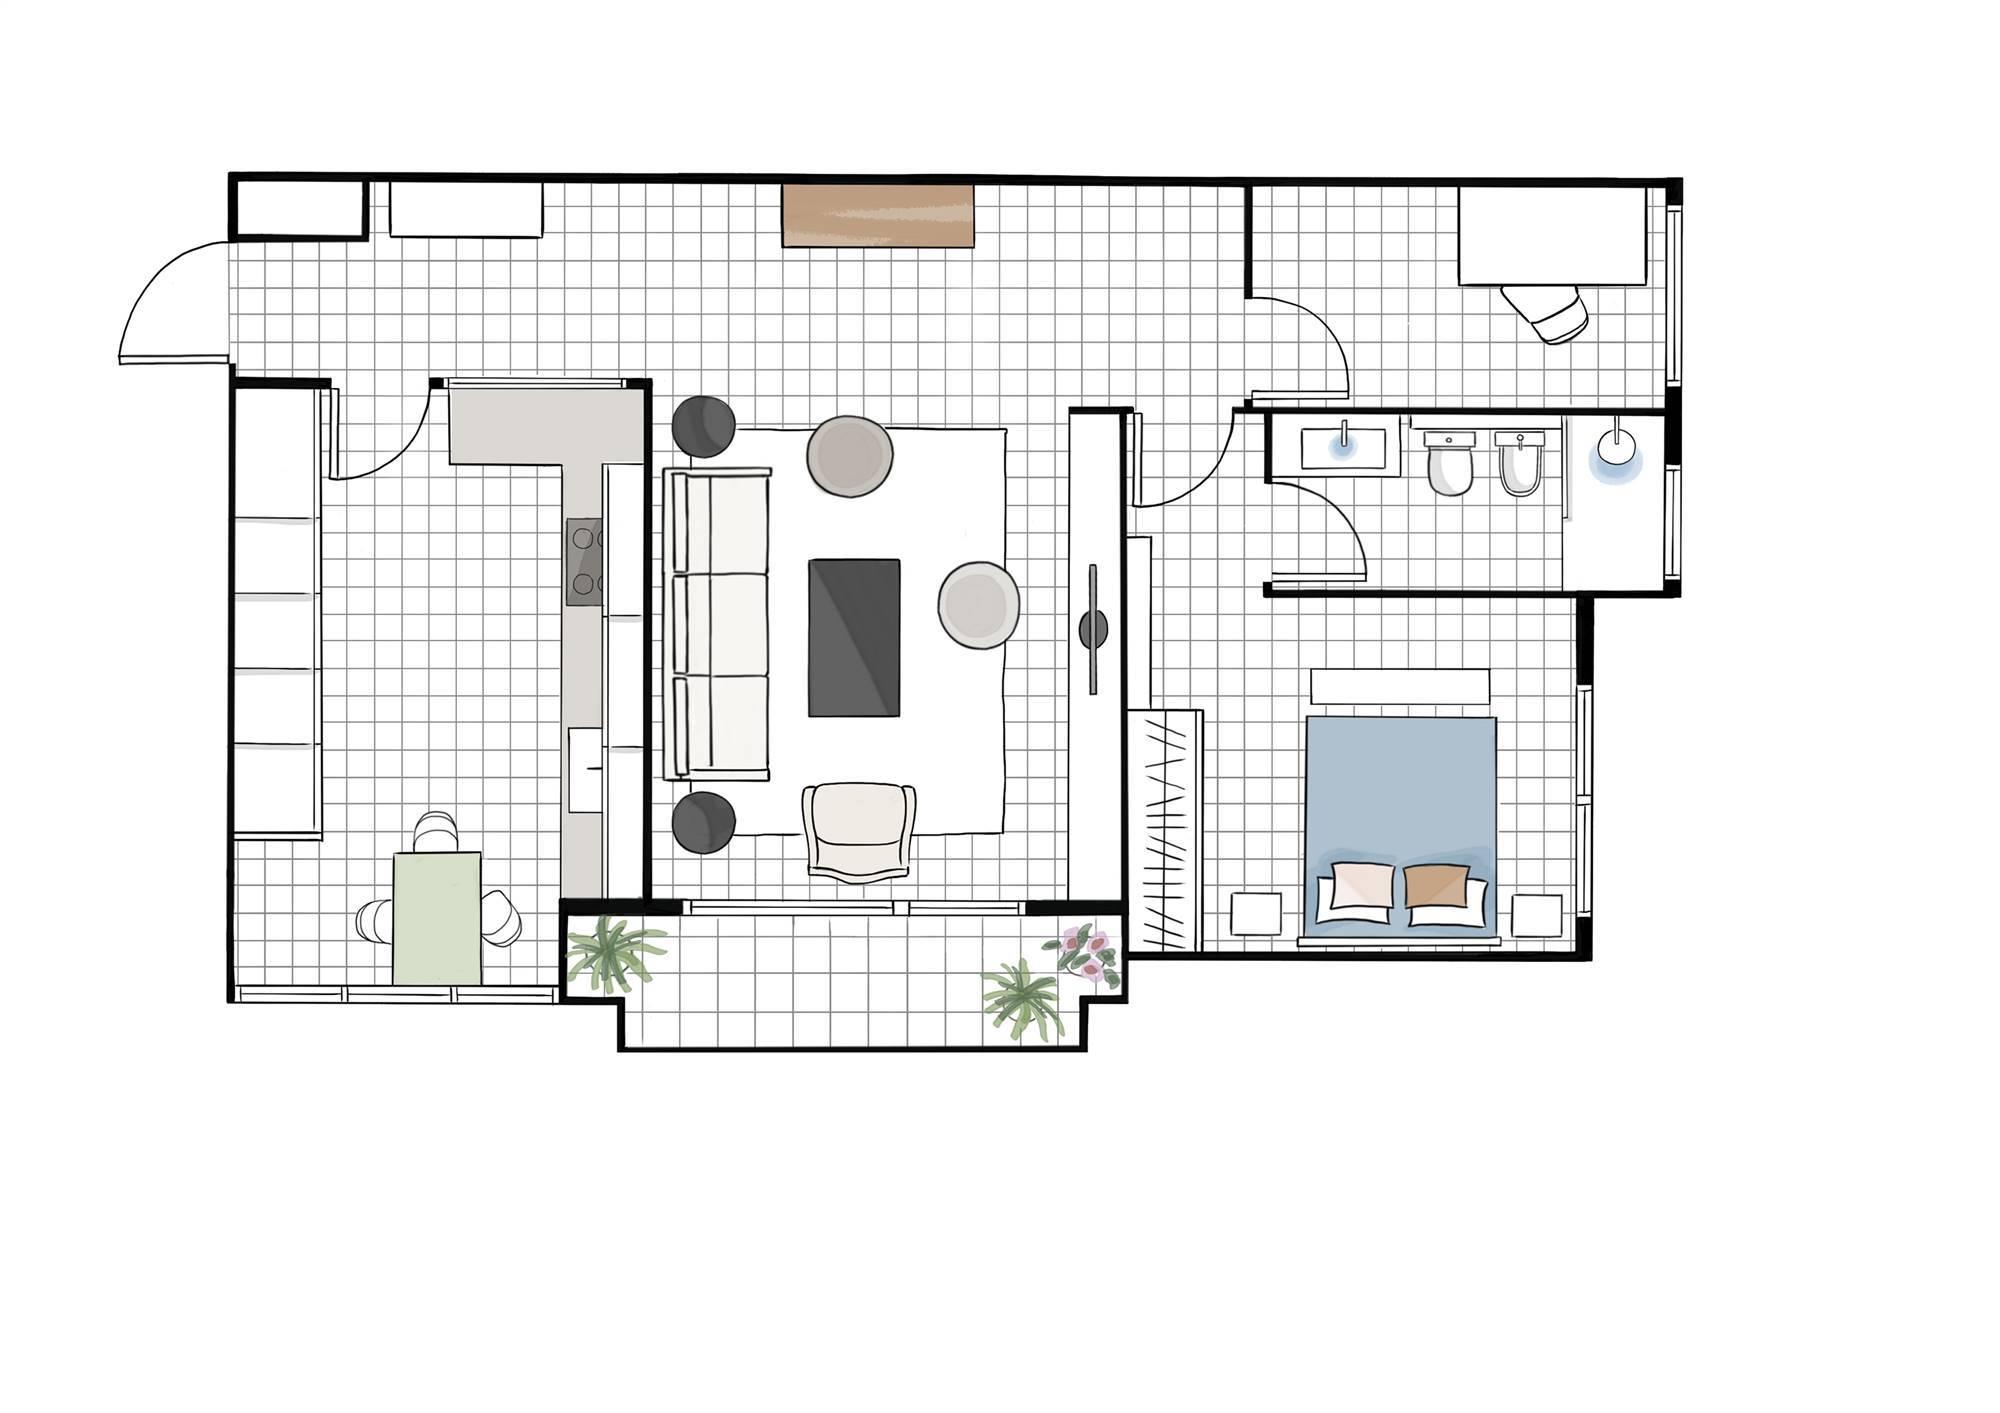 Negurigane SC地板。 50平米,更宽敞舒适